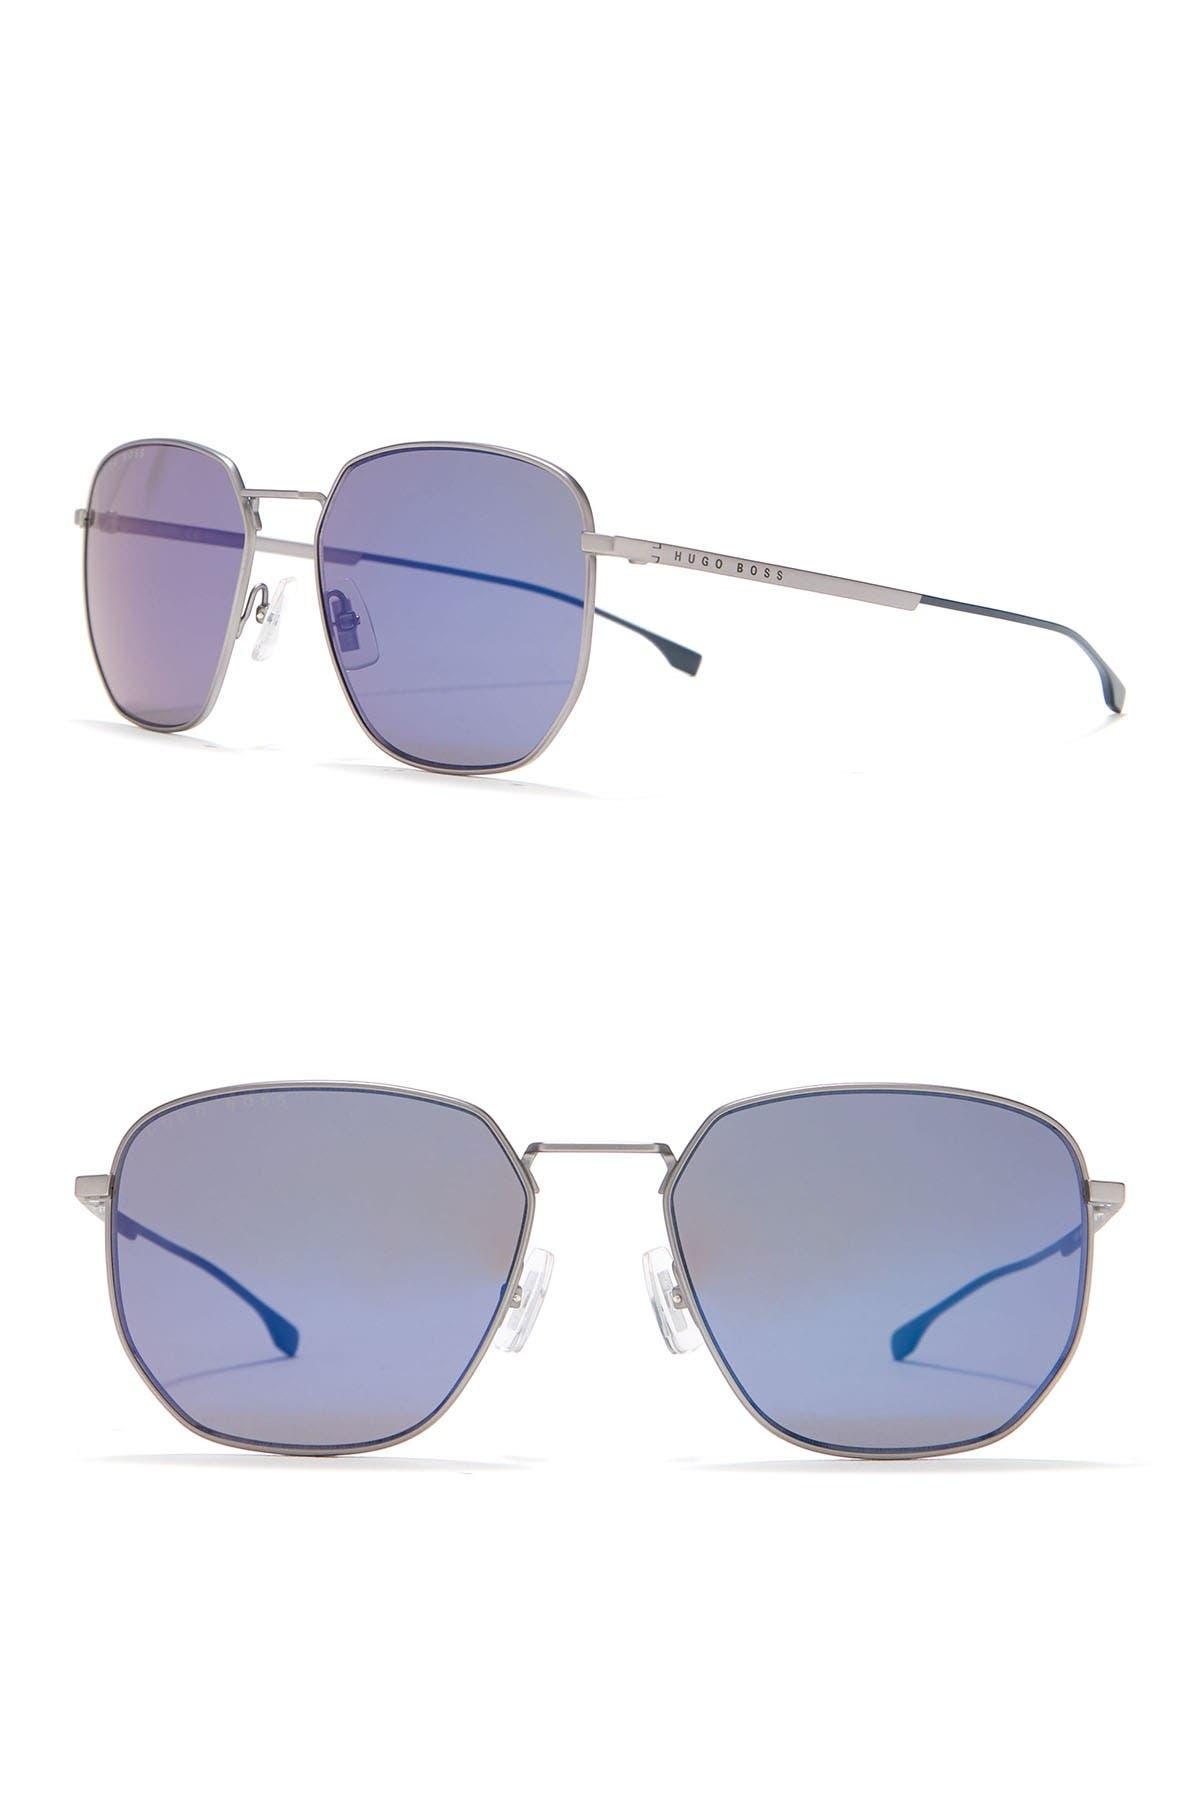 Image of BOSS 58mm Aviator Sunglasses